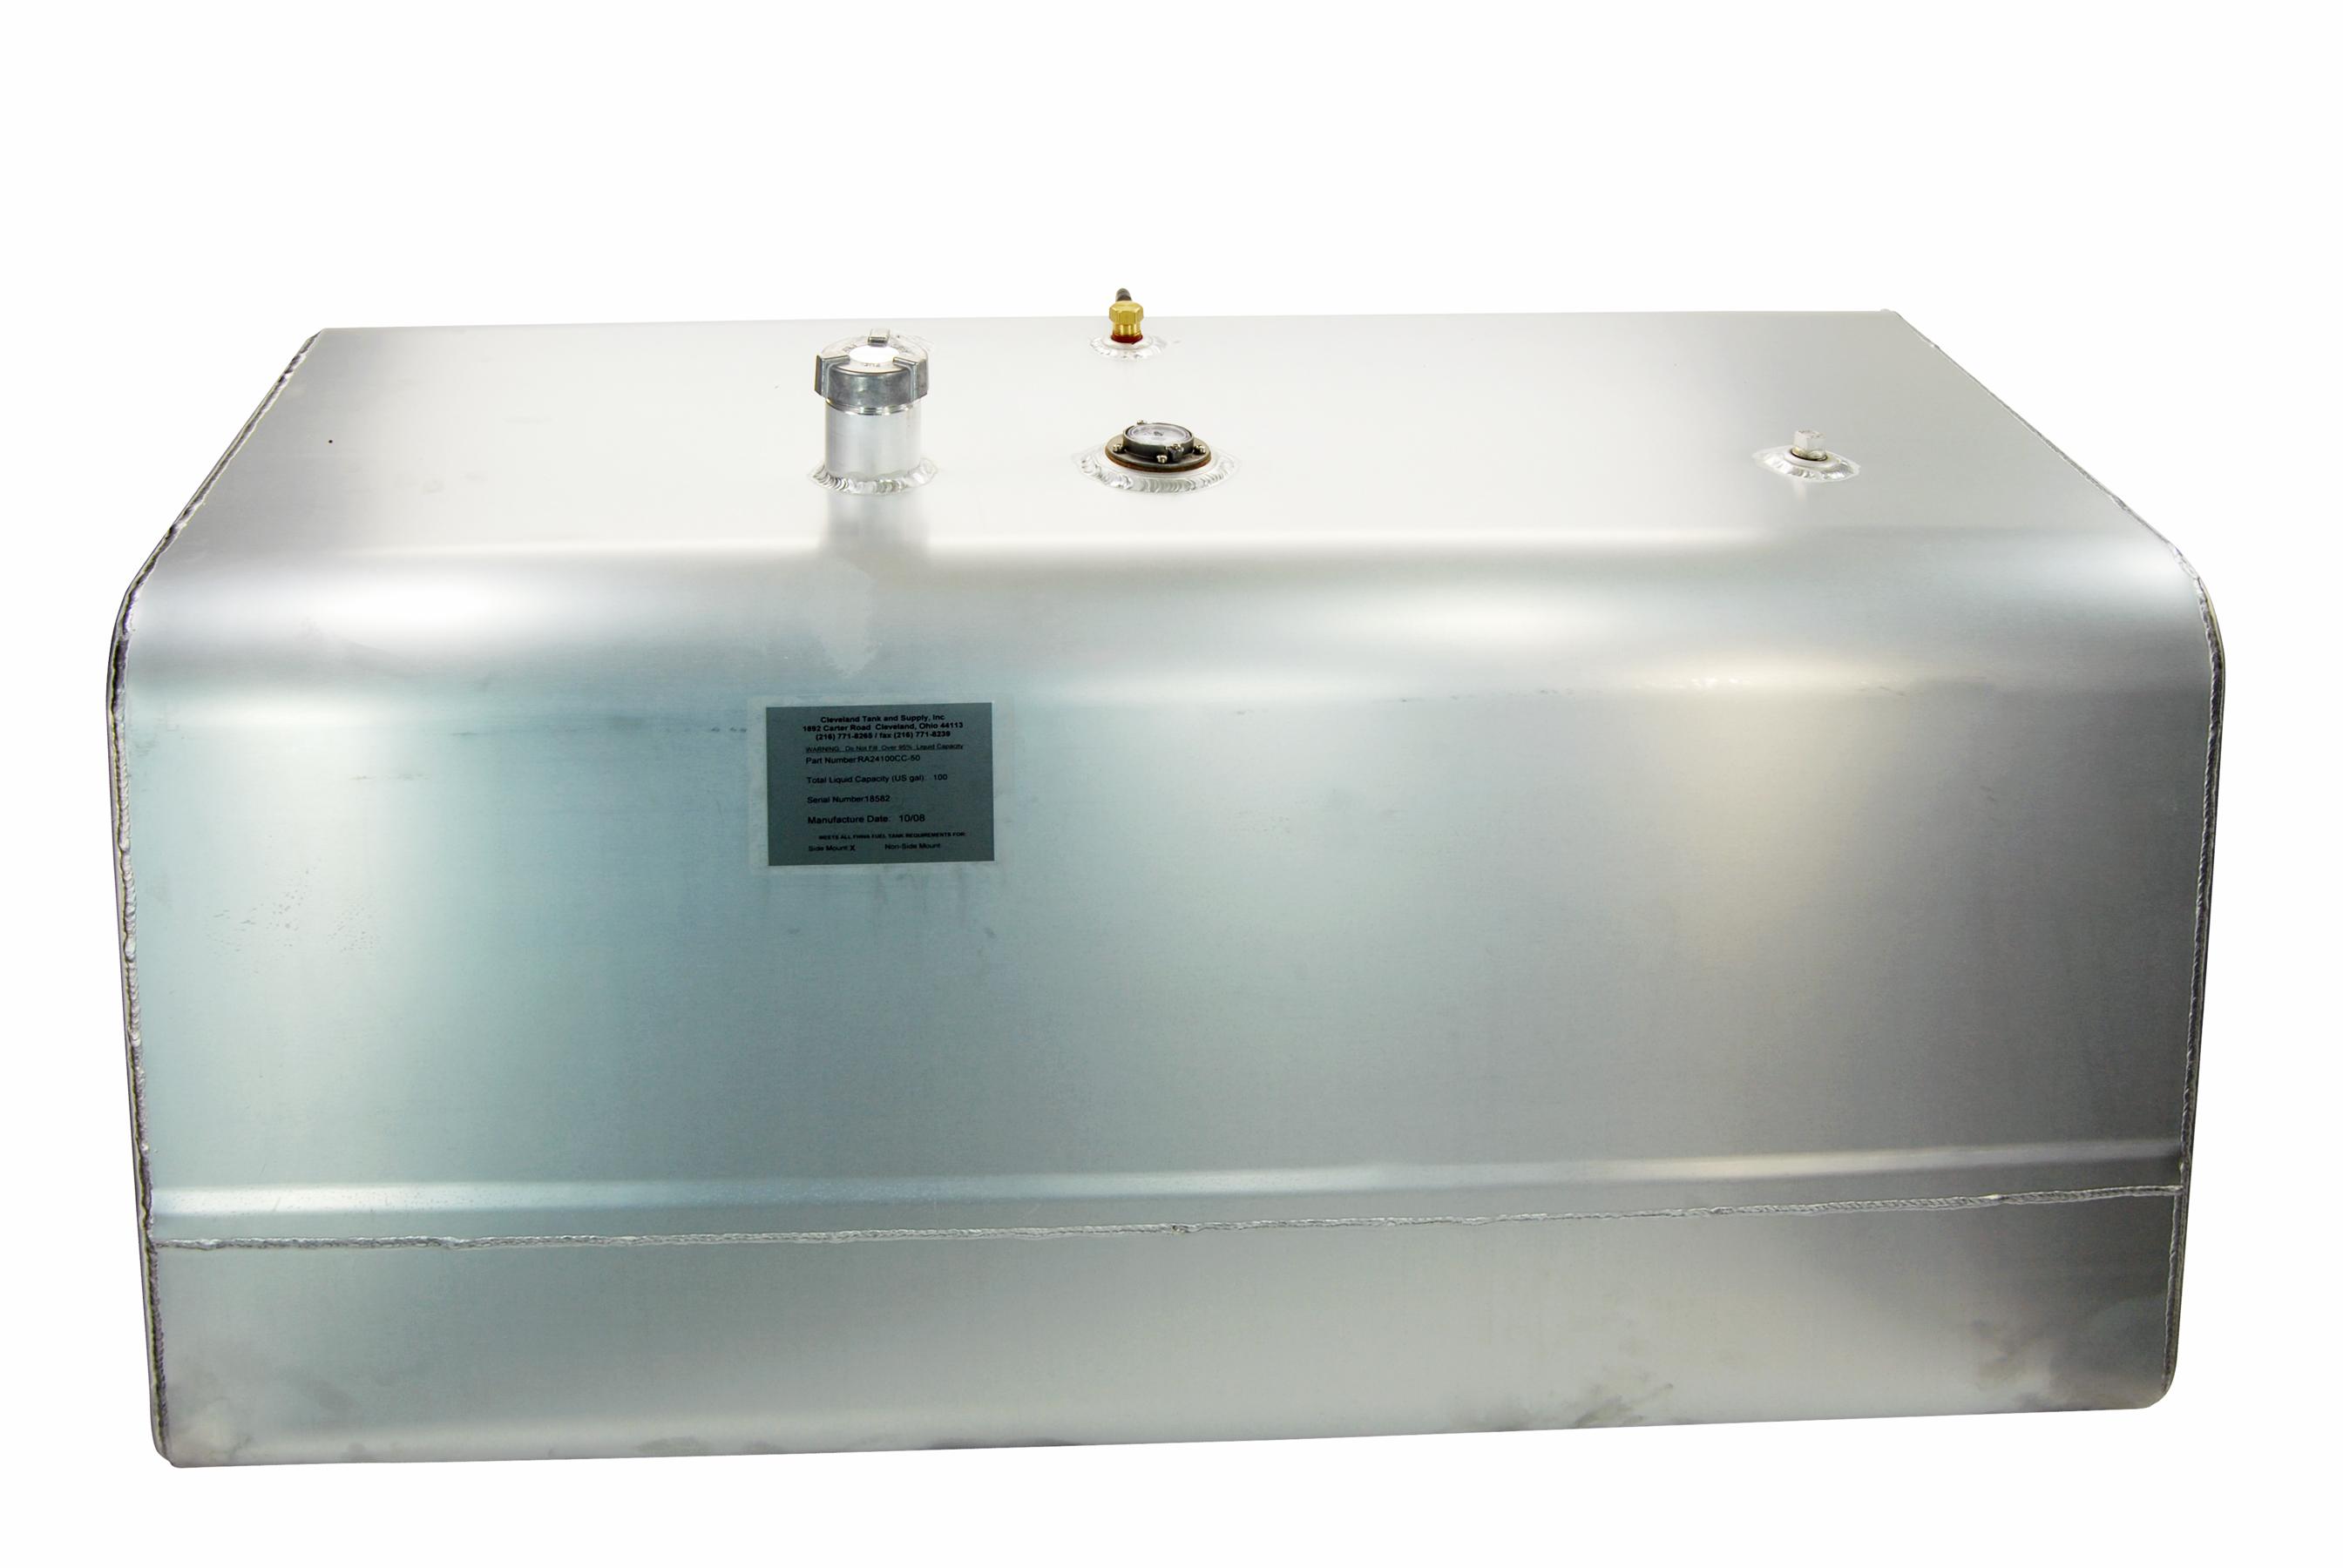 Cleveland Tank Announces New D O T Certified Aluminum